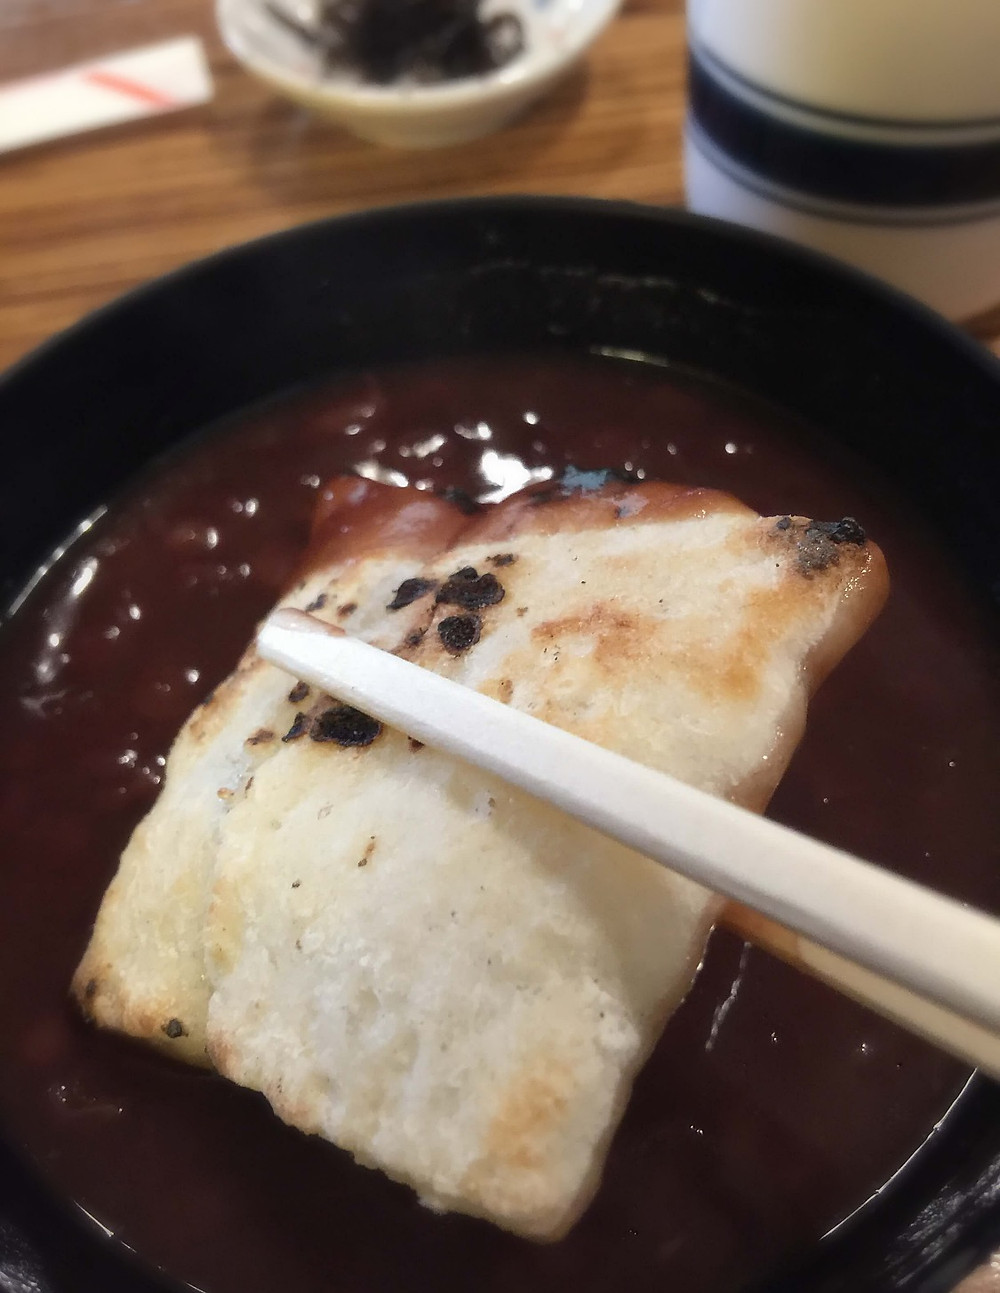 Deiribashi Kintsubaya's grilled mochi in zenzai